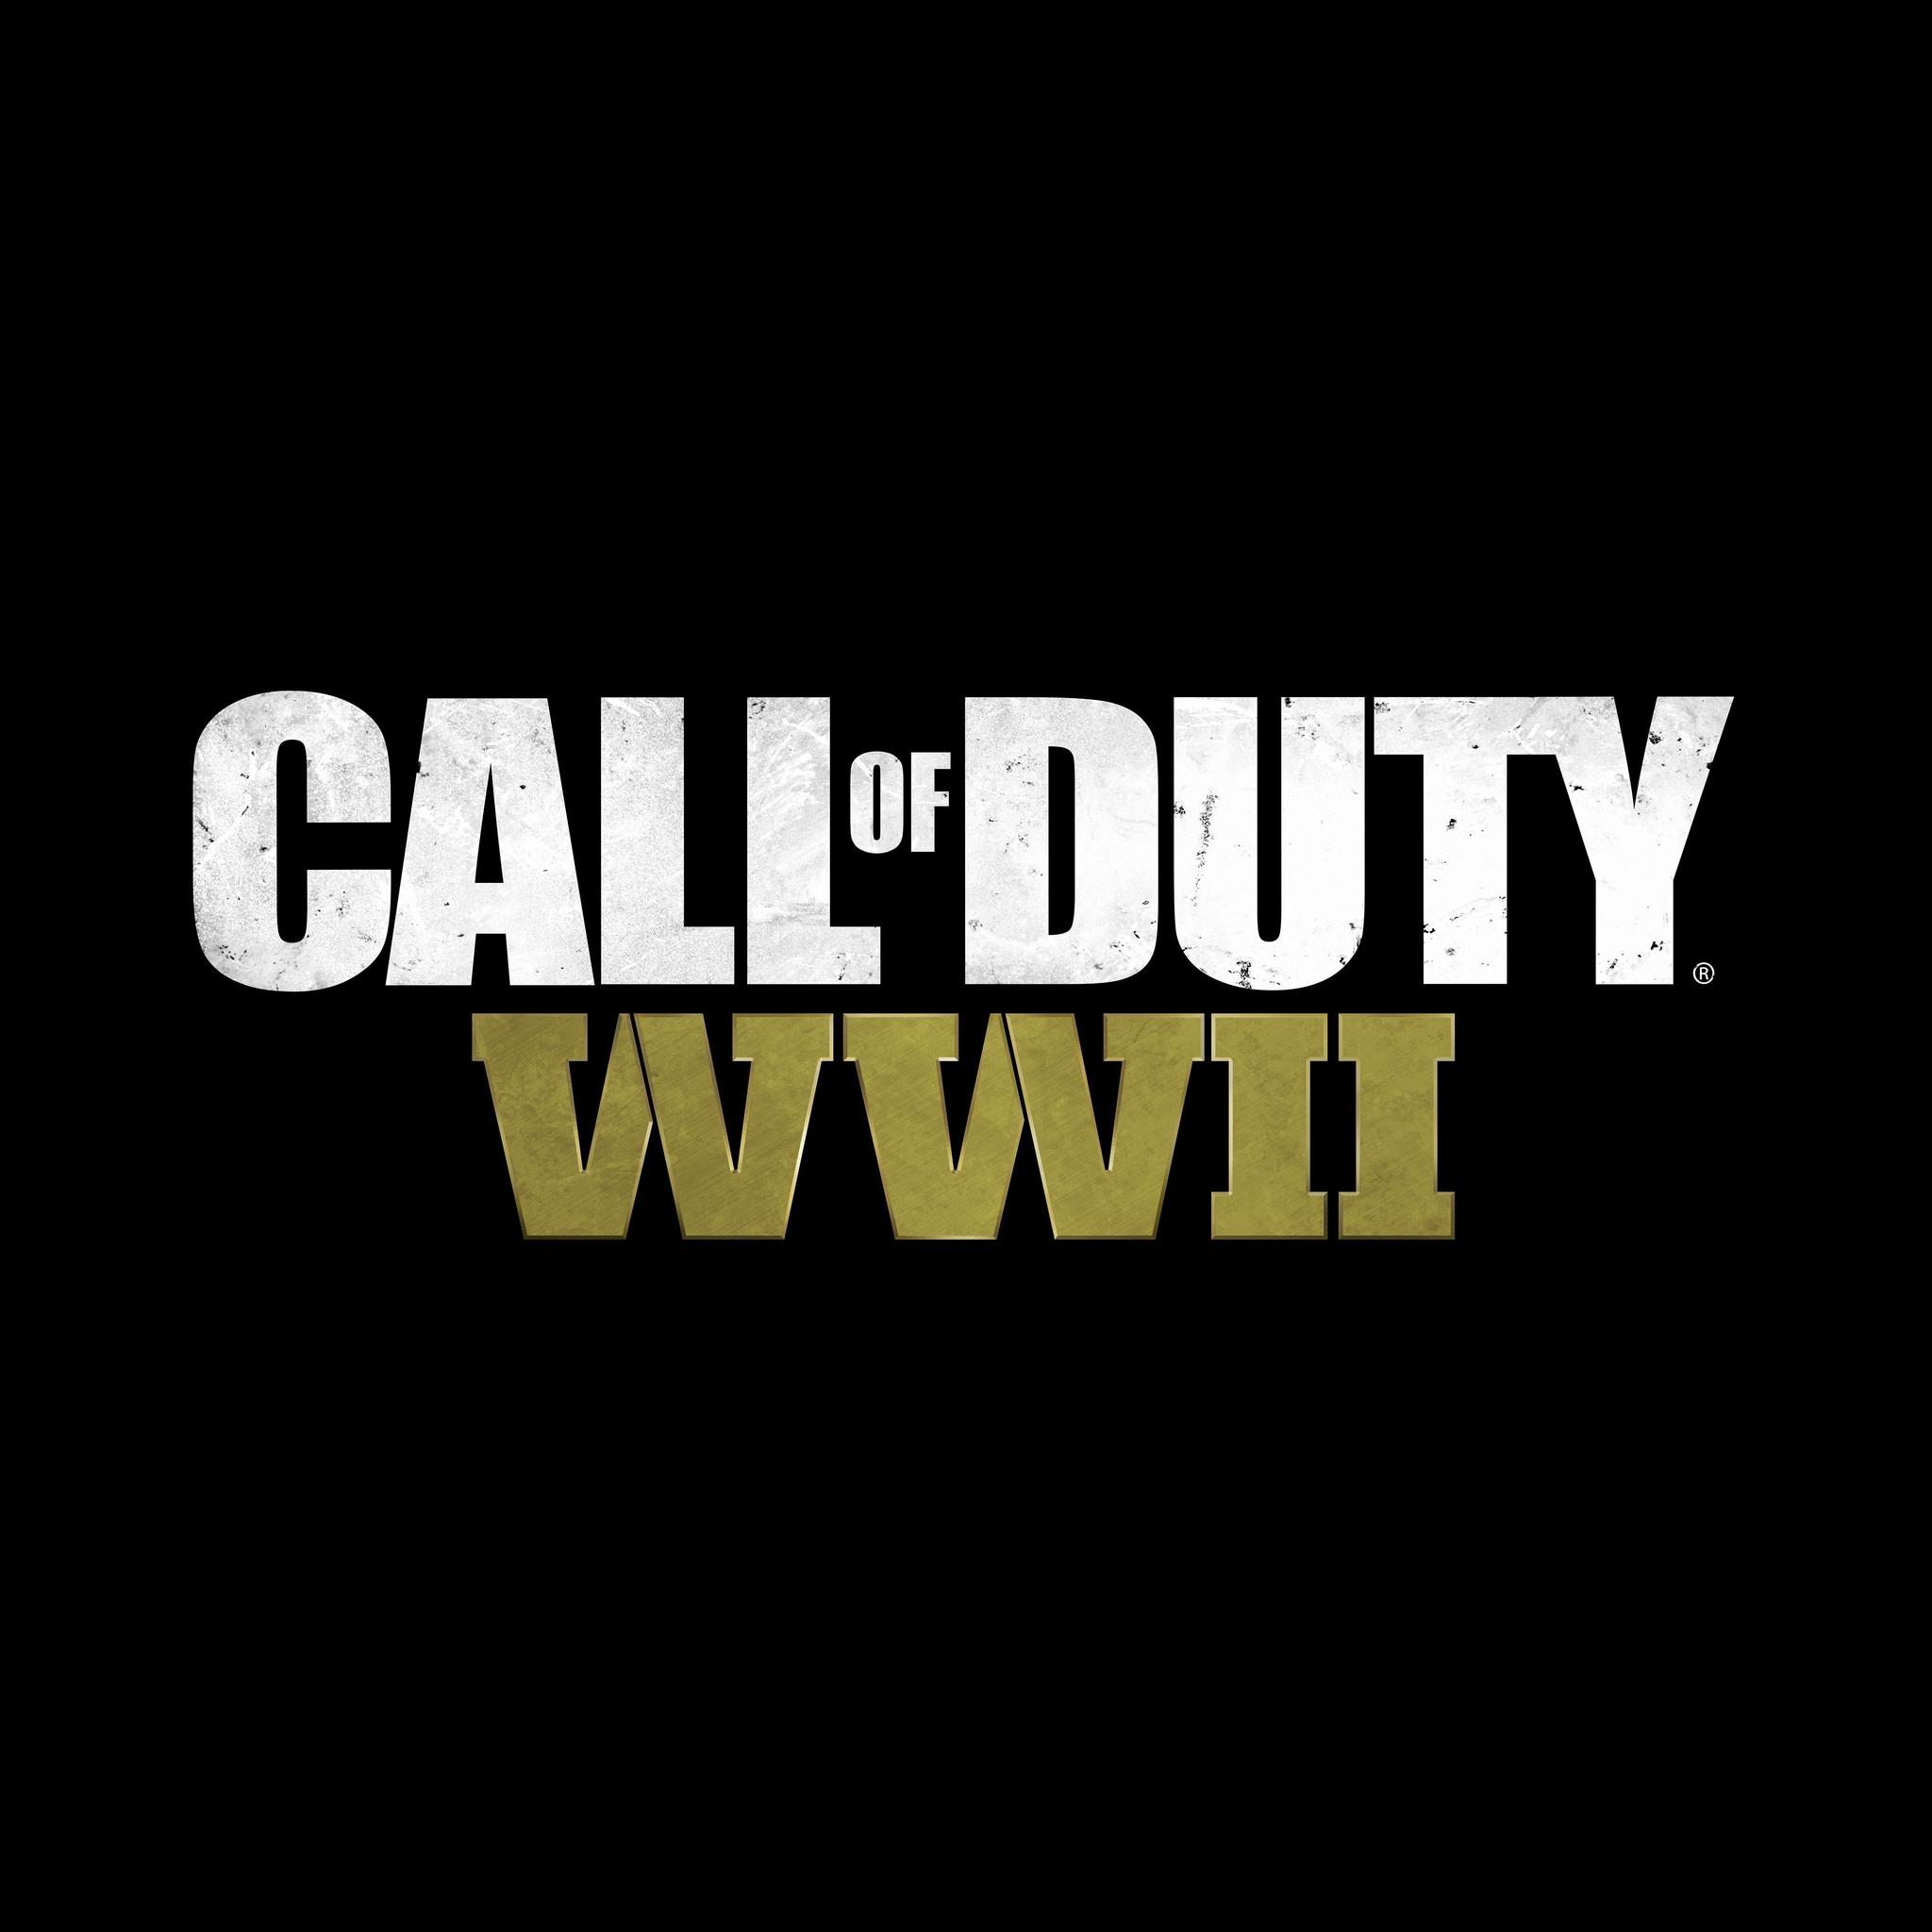 2048x2048 call of duty ww2 logo 8k ipad air hd 4k - Call of duty ww2 desktop ...